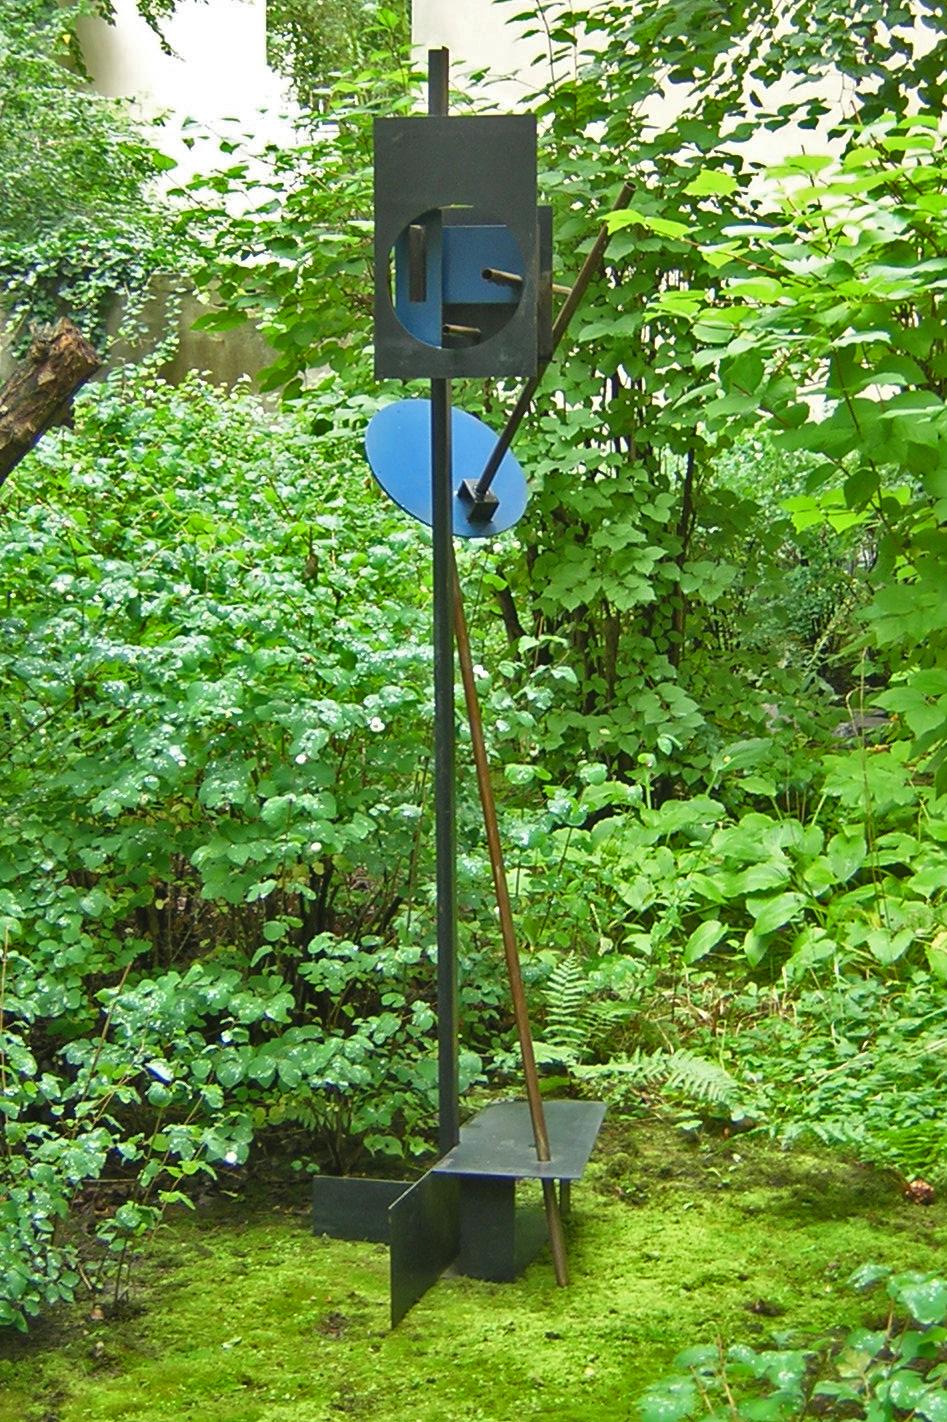 Signal 1962 Stahl zweifarbig, ca. 2,20 m